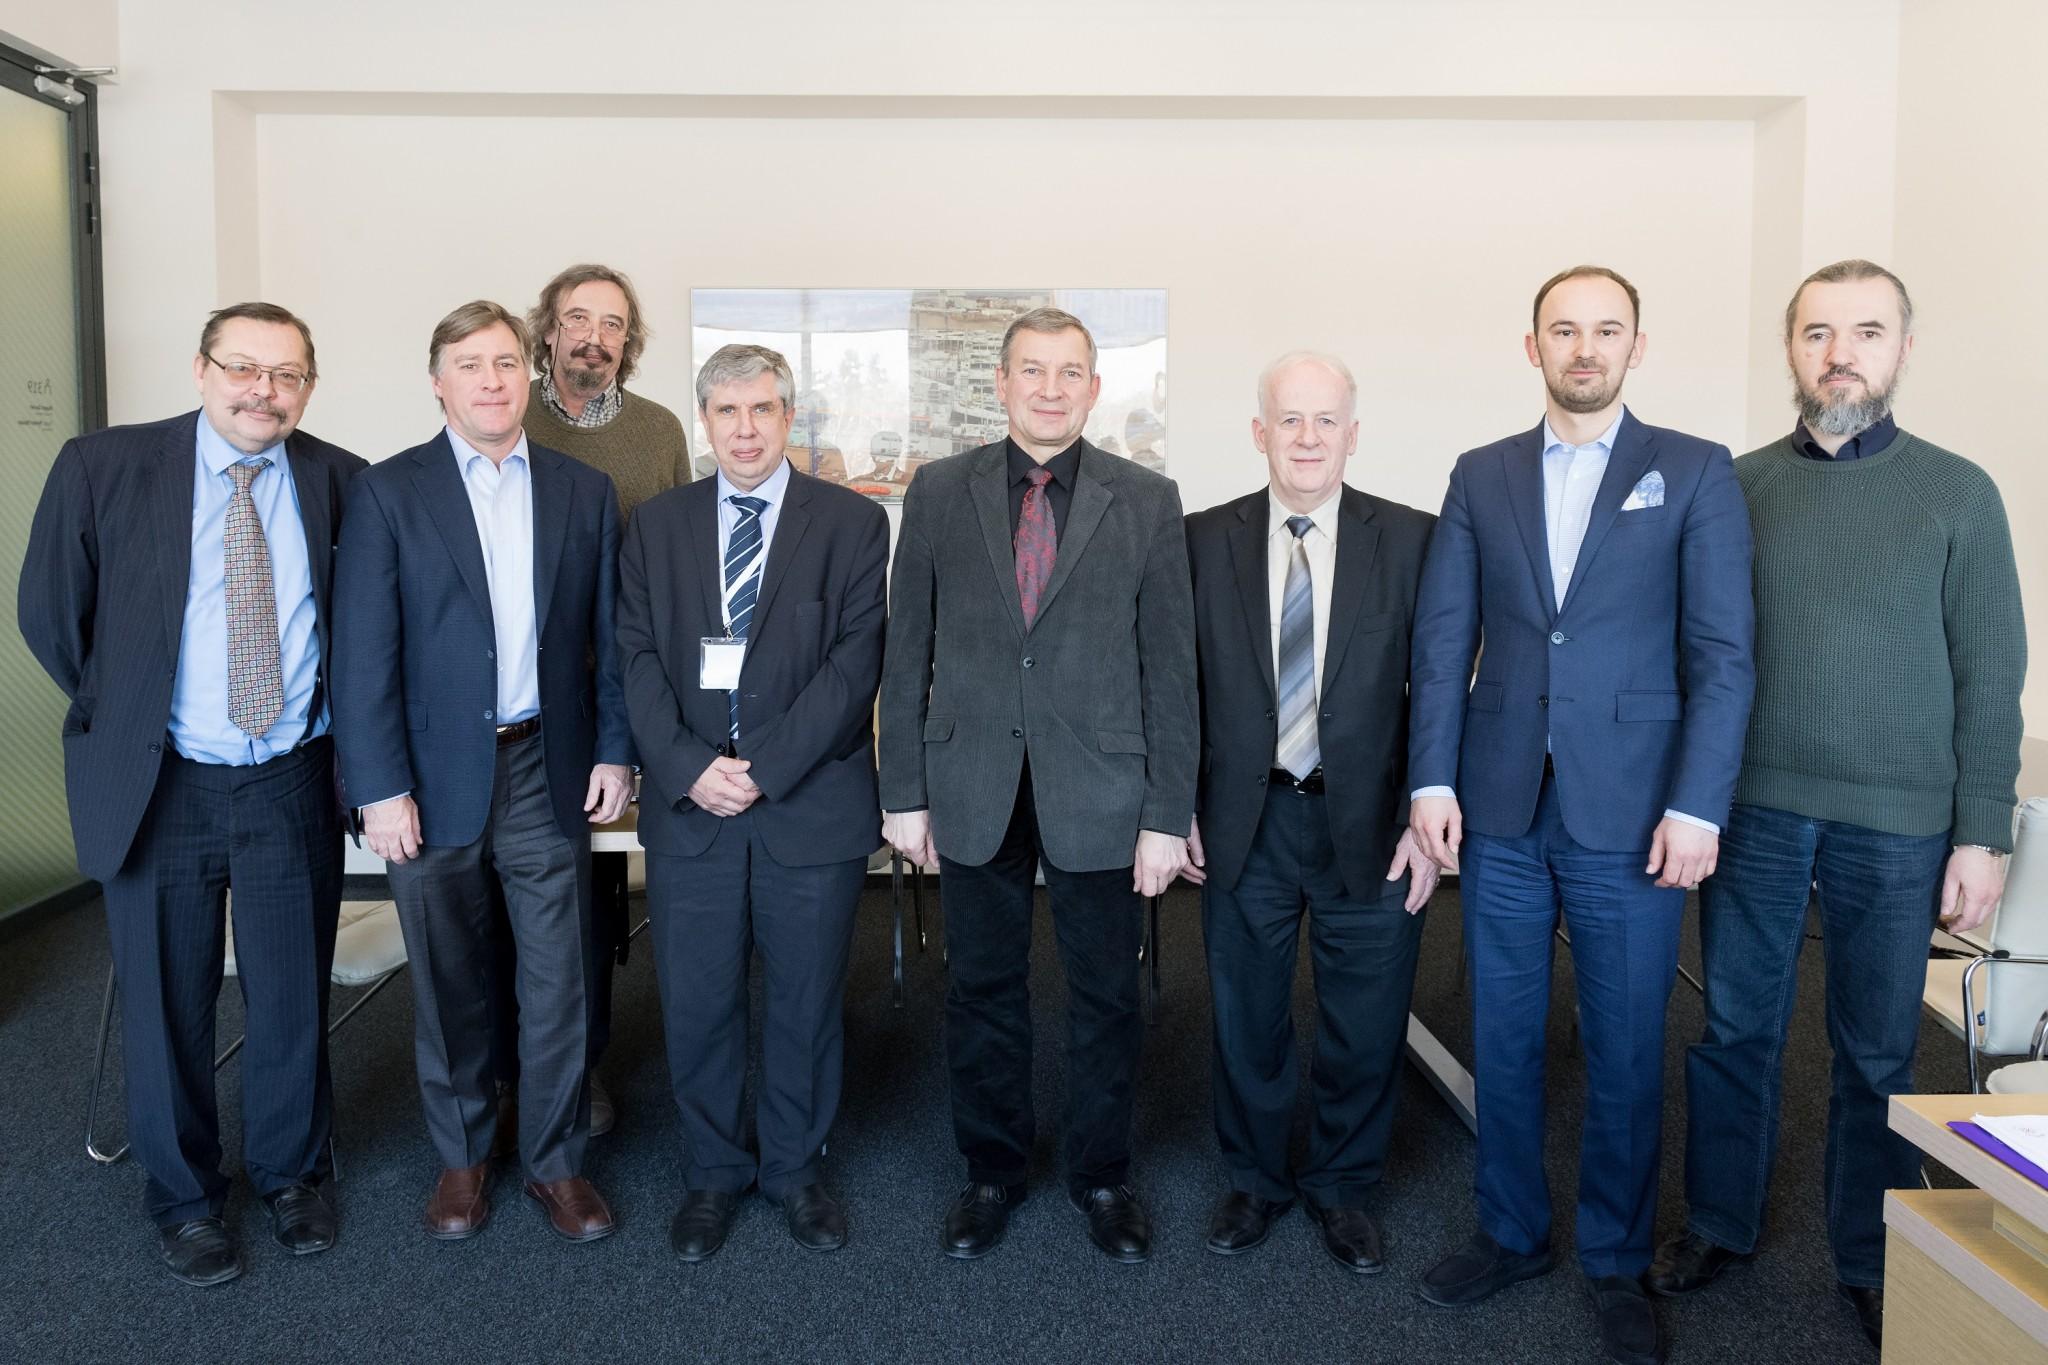 The LAS and Skoltech delegations. From left: Andris Vilcāns, Keith Stevenson, Yuri Kotelevtsev, Alexey Ponomarev, Ojārs Sparītis, Clement Fortin, Alexander Safonov and Mikhail Skvortsov. Photo: Skoltech.